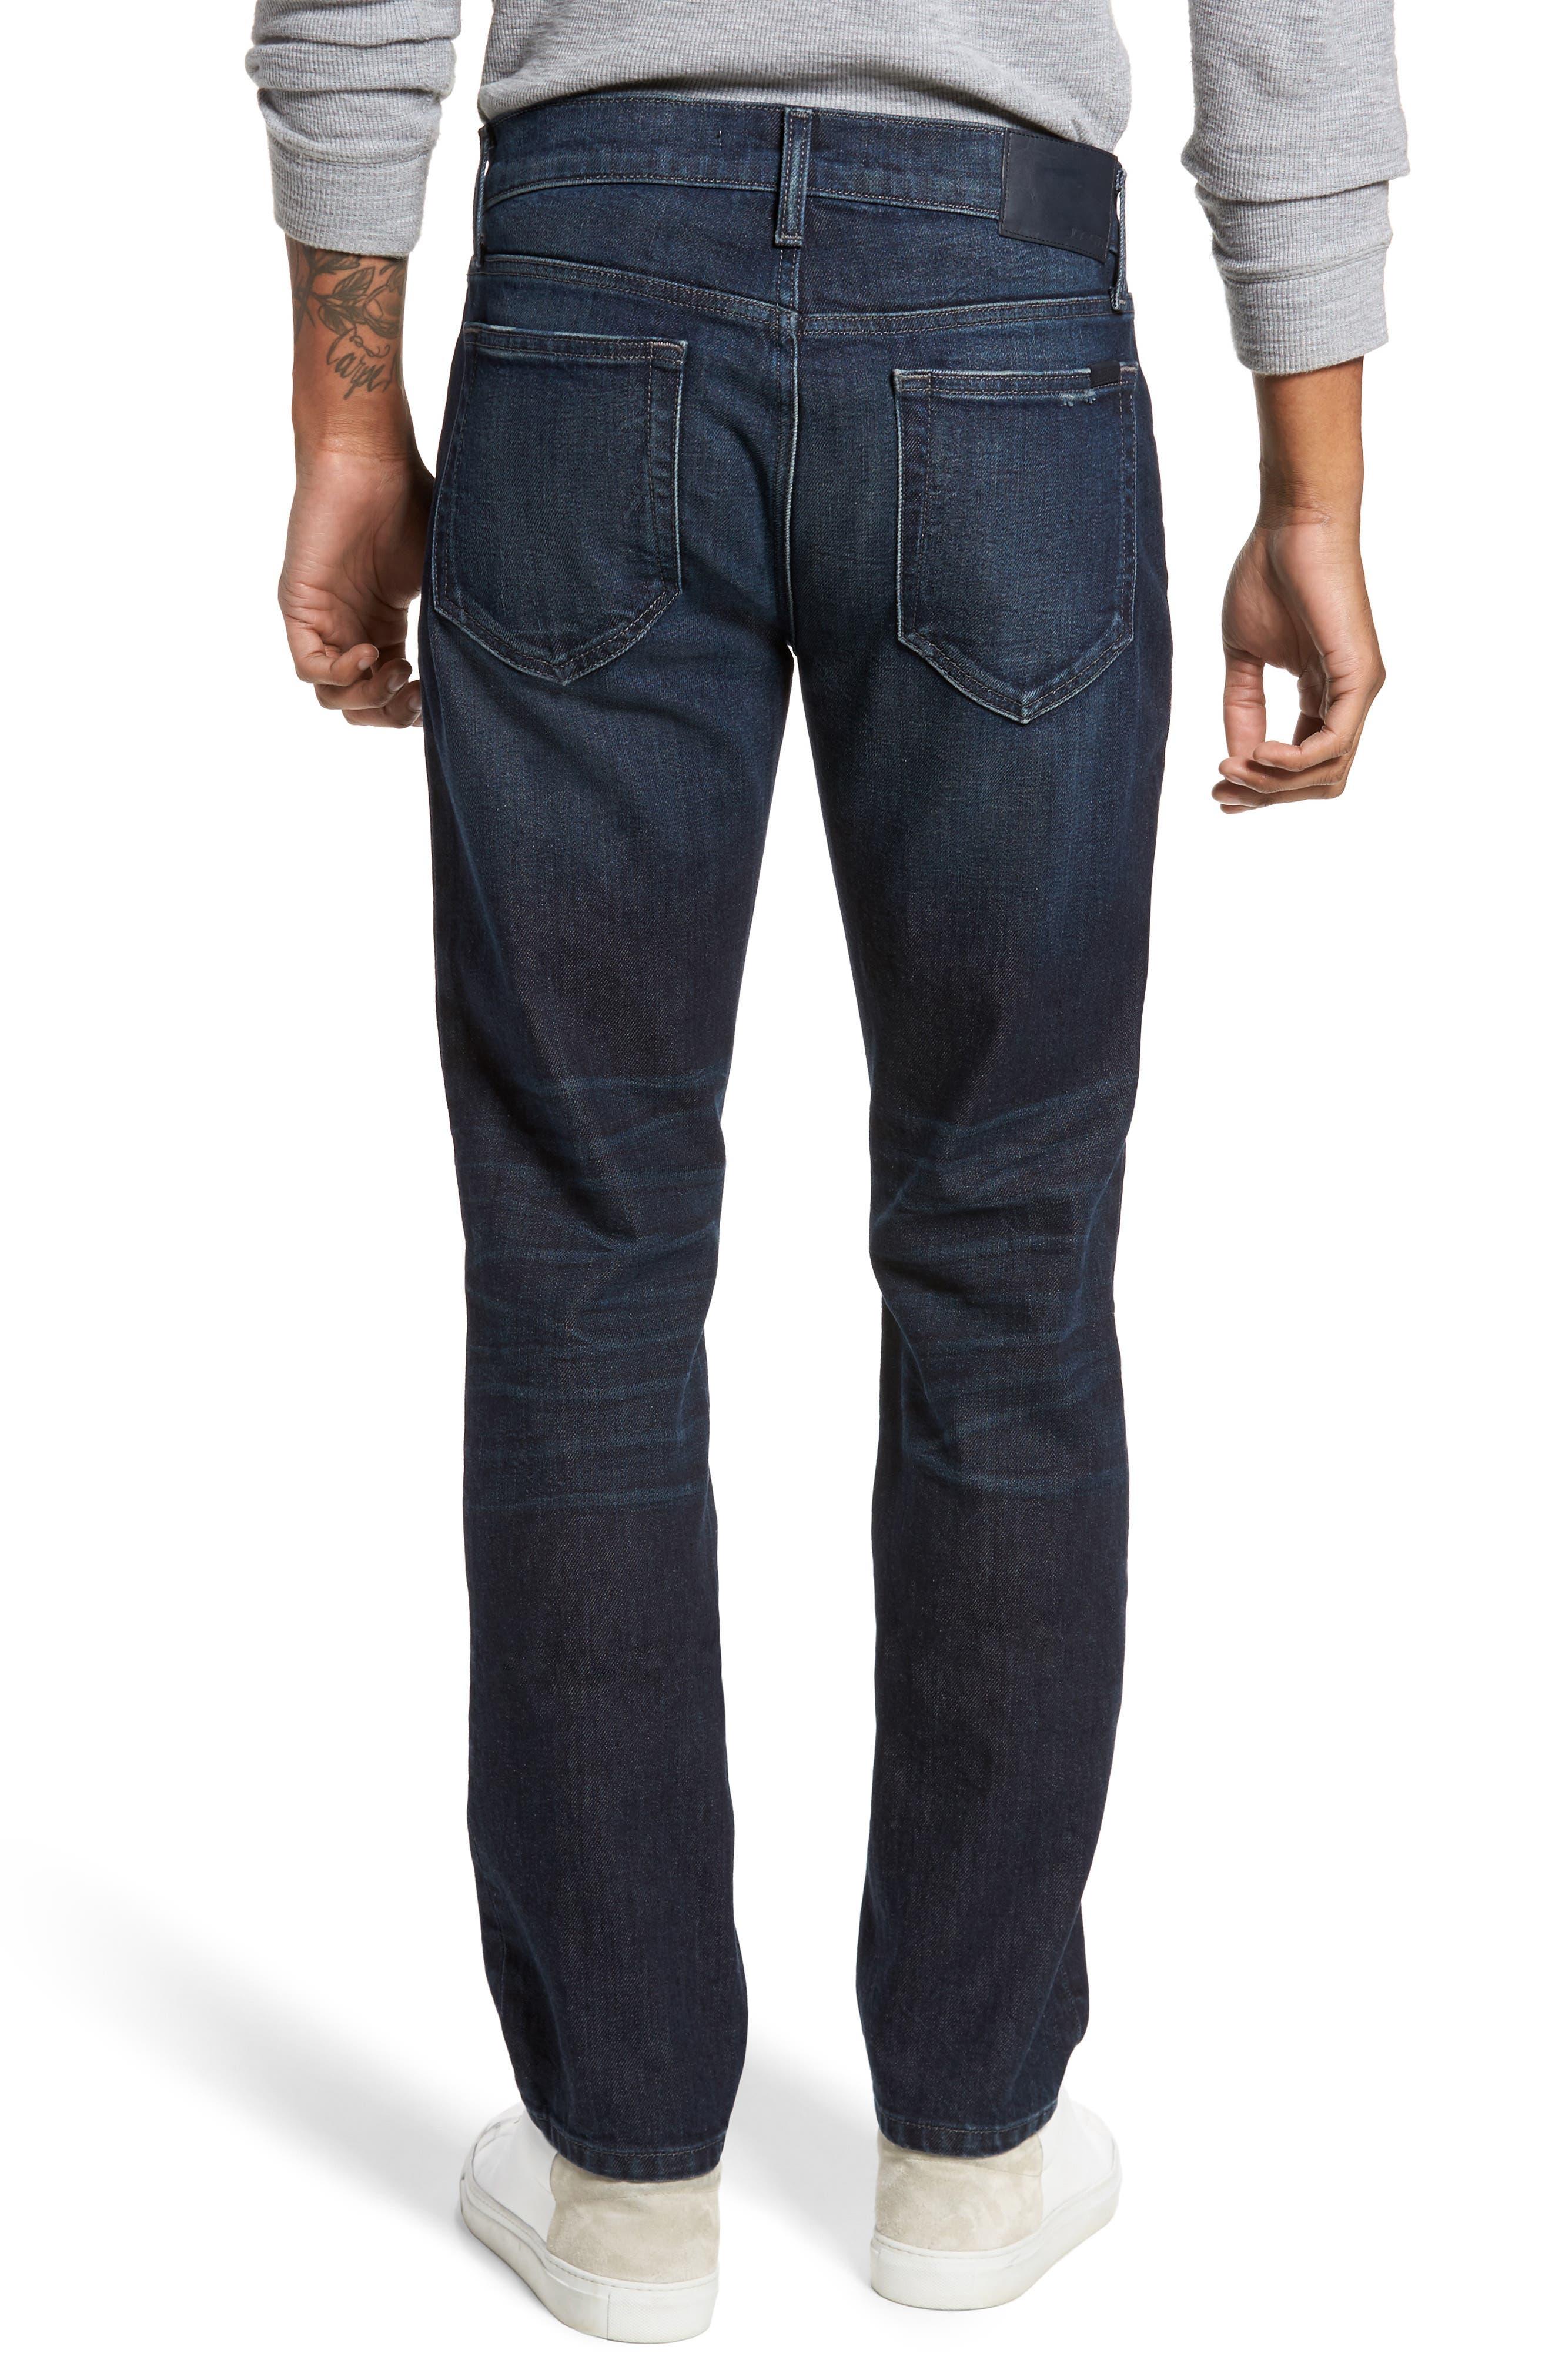 Brixton Slim Straight Leg Jeans,                             Alternate thumbnail 2, color,                             415